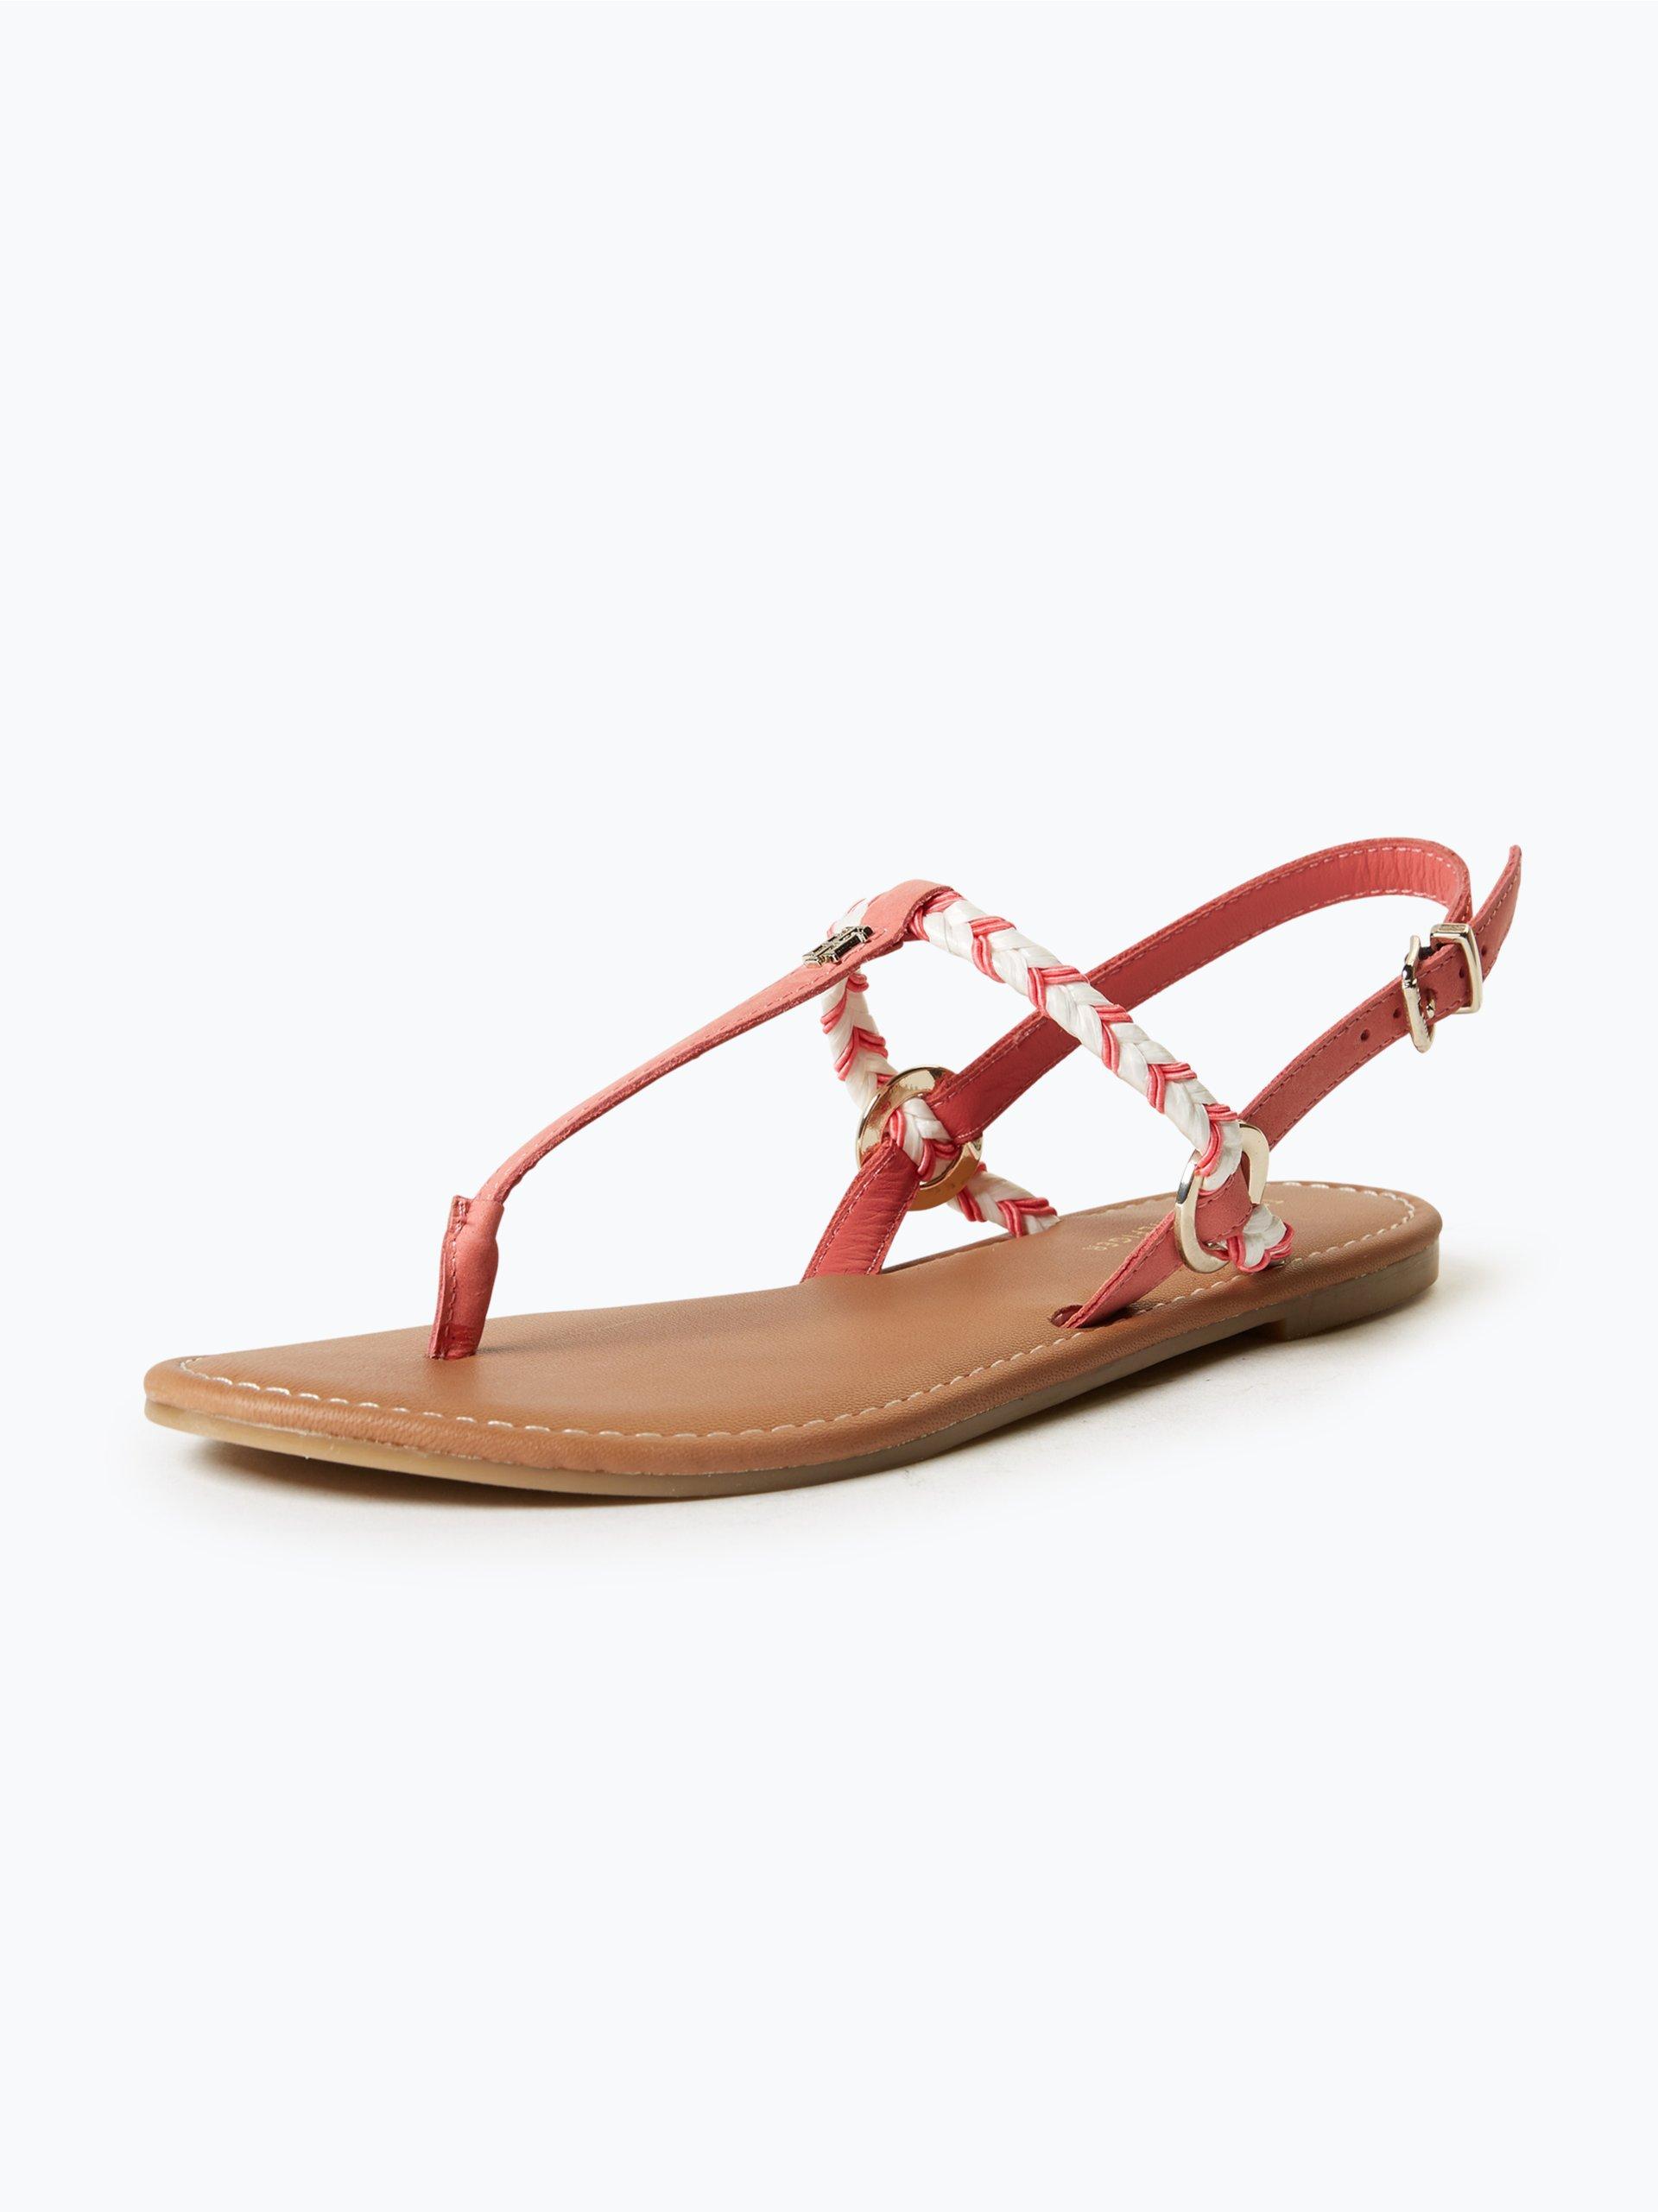 tommy hilfiger damen sandalen aus leder 2 online kaufen peek und cloppenburg de. Black Bedroom Furniture Sets. Home Design Ideas